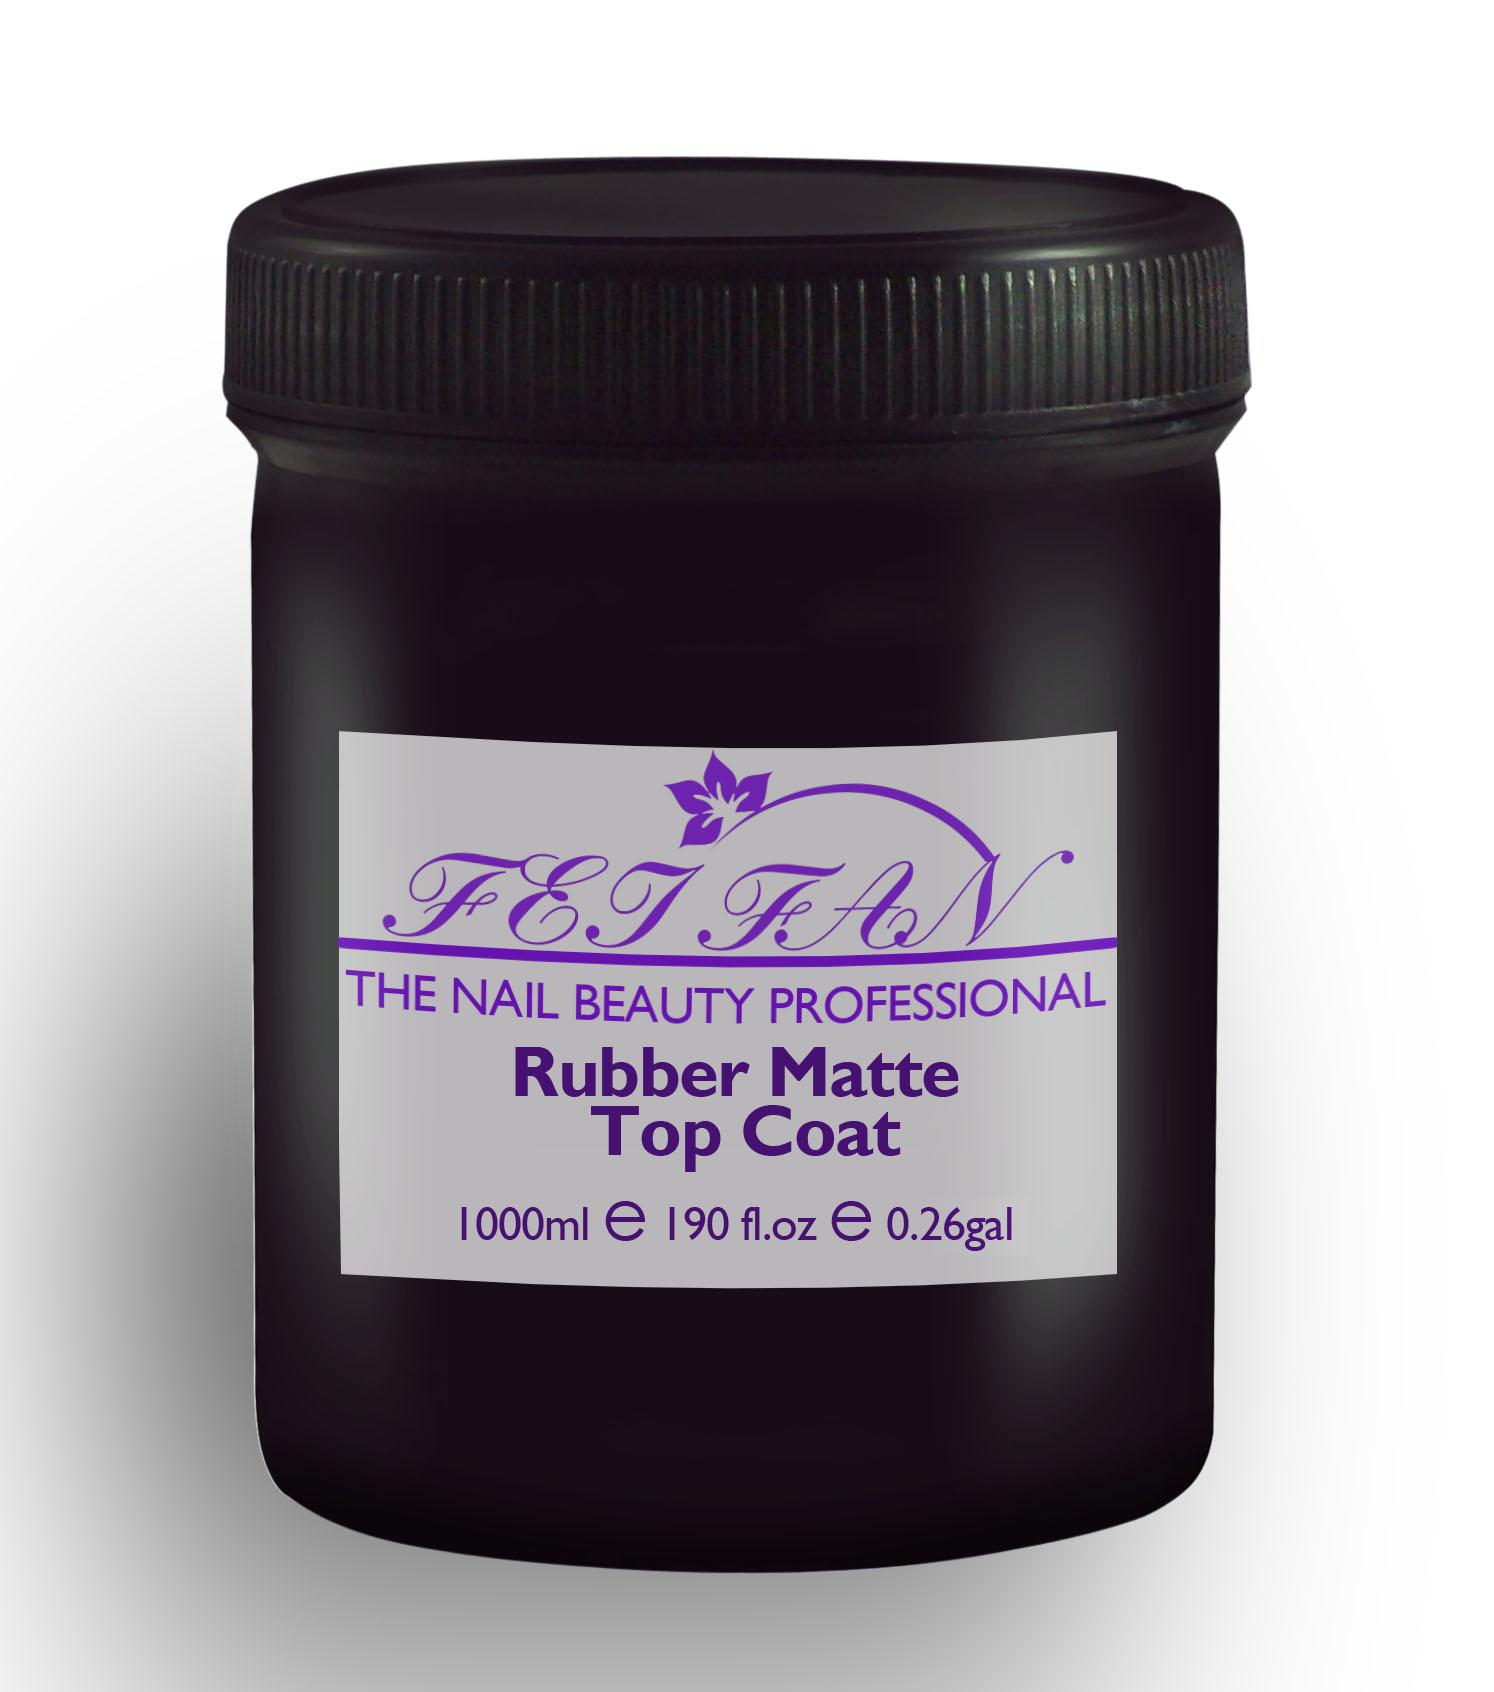 Rubber matte top coat nail polish uv gel buy uv gel polish soak off